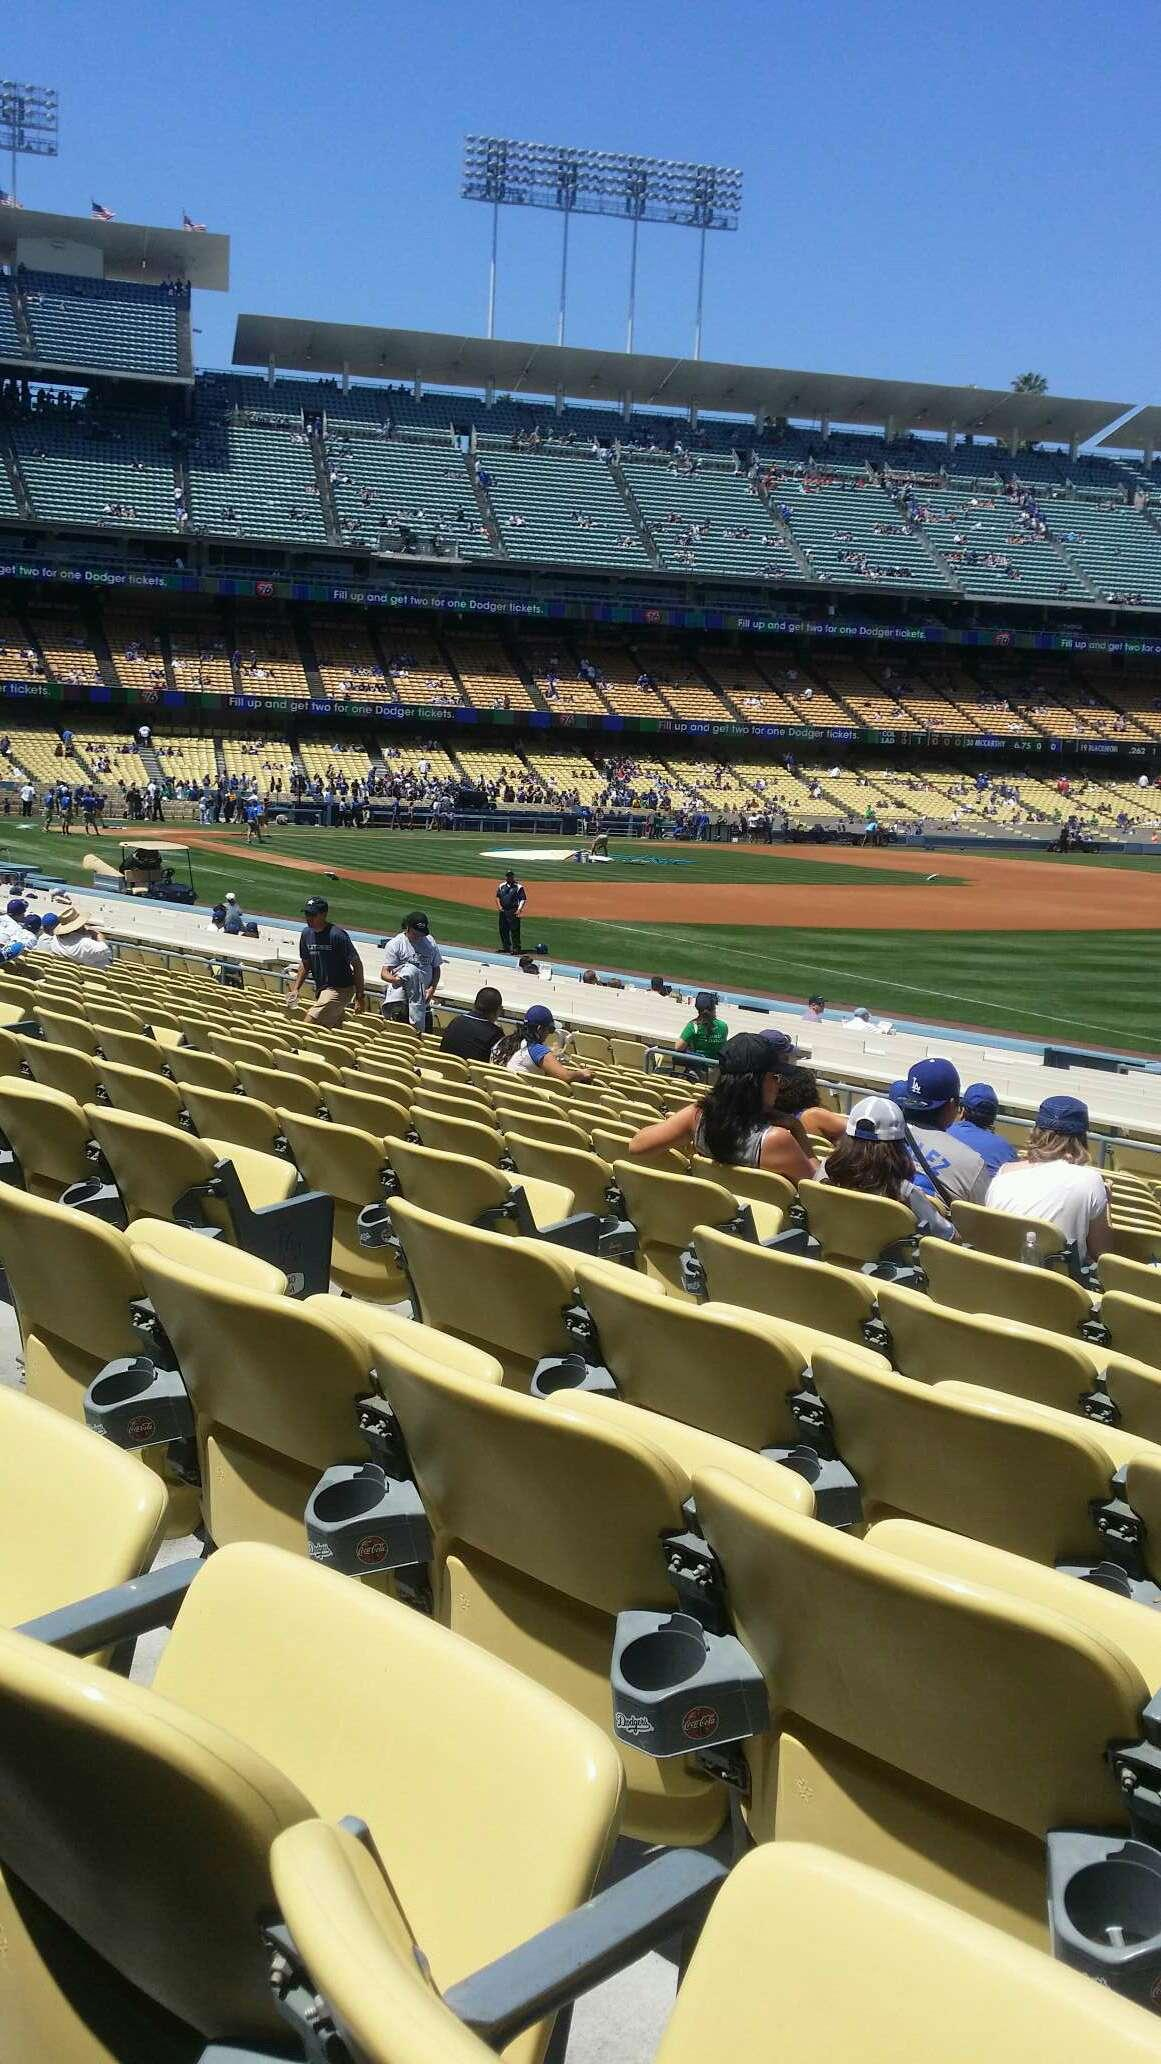 Dodger stadium section 42fd row p seat 6 los angeles dodgers vs